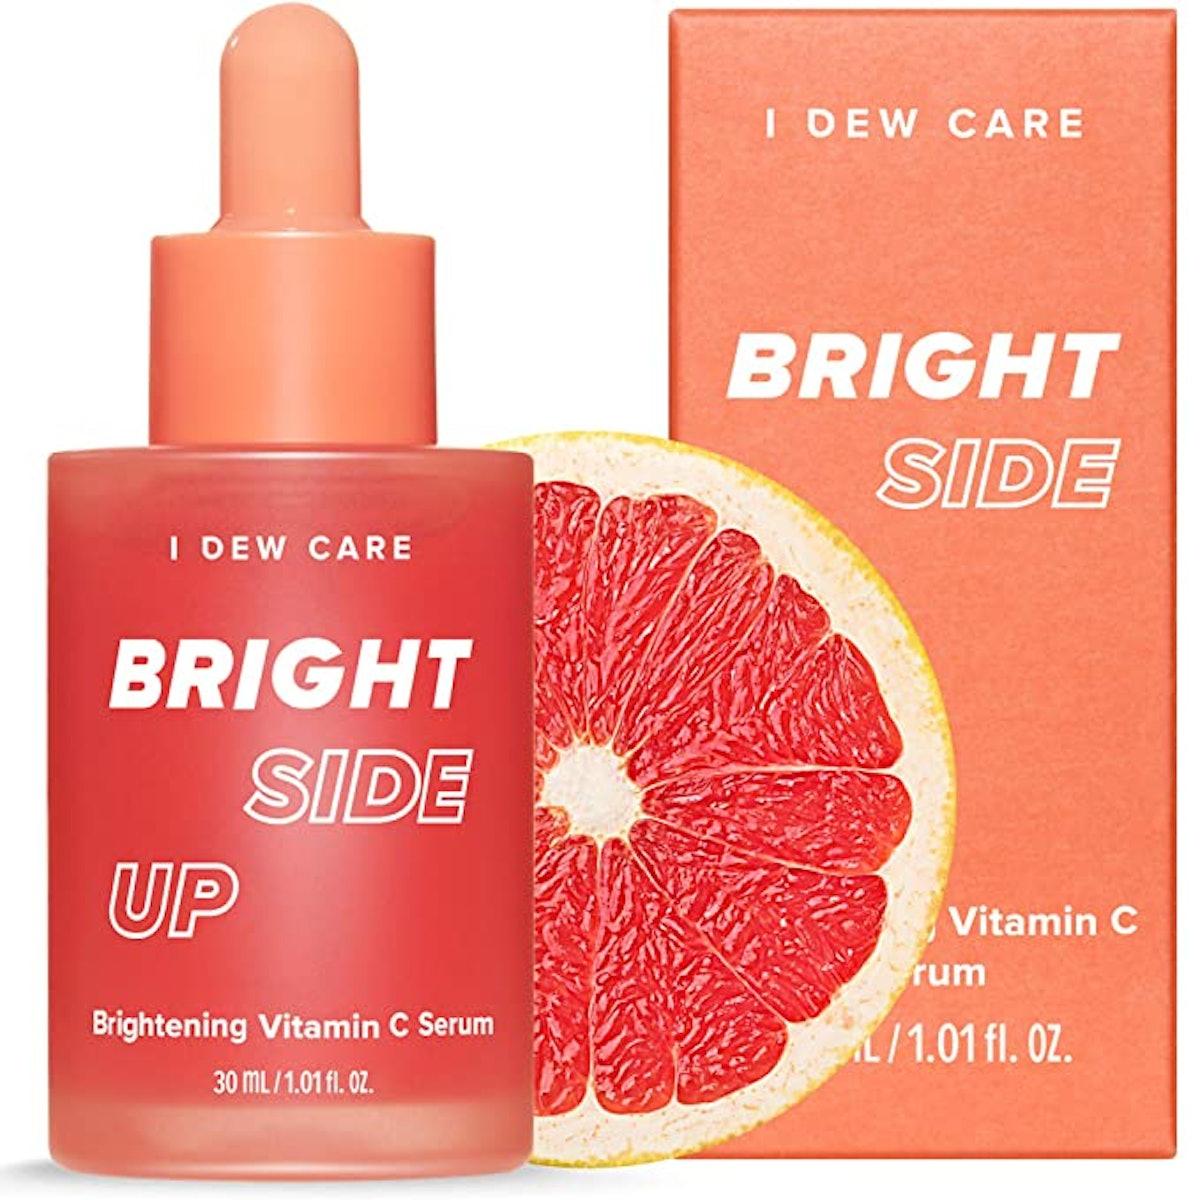 I DEW CARE Bright Side Up Brightening Vitamin C Serum with Niacinamide